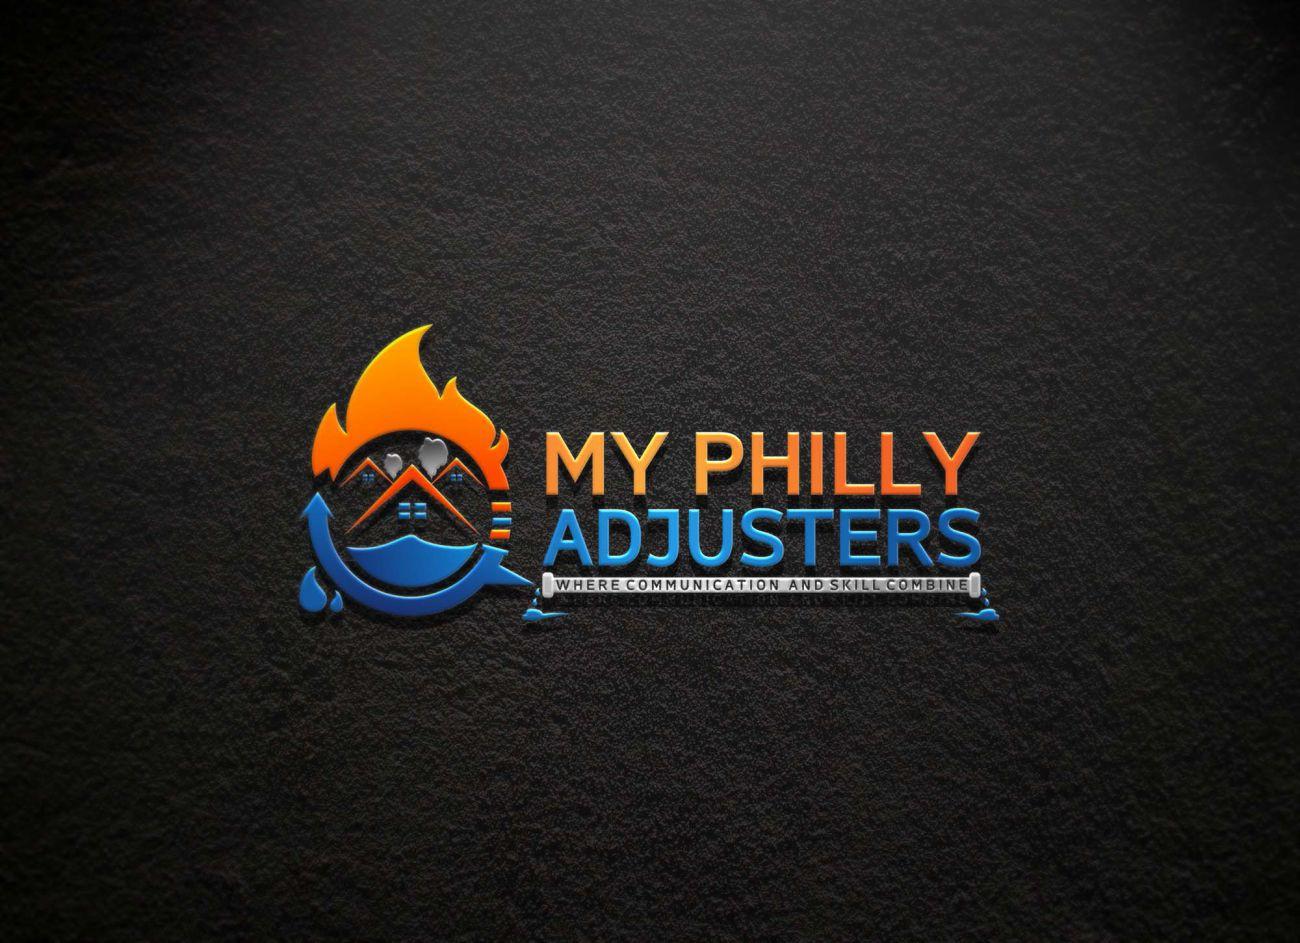 MyPhillyAdjusters